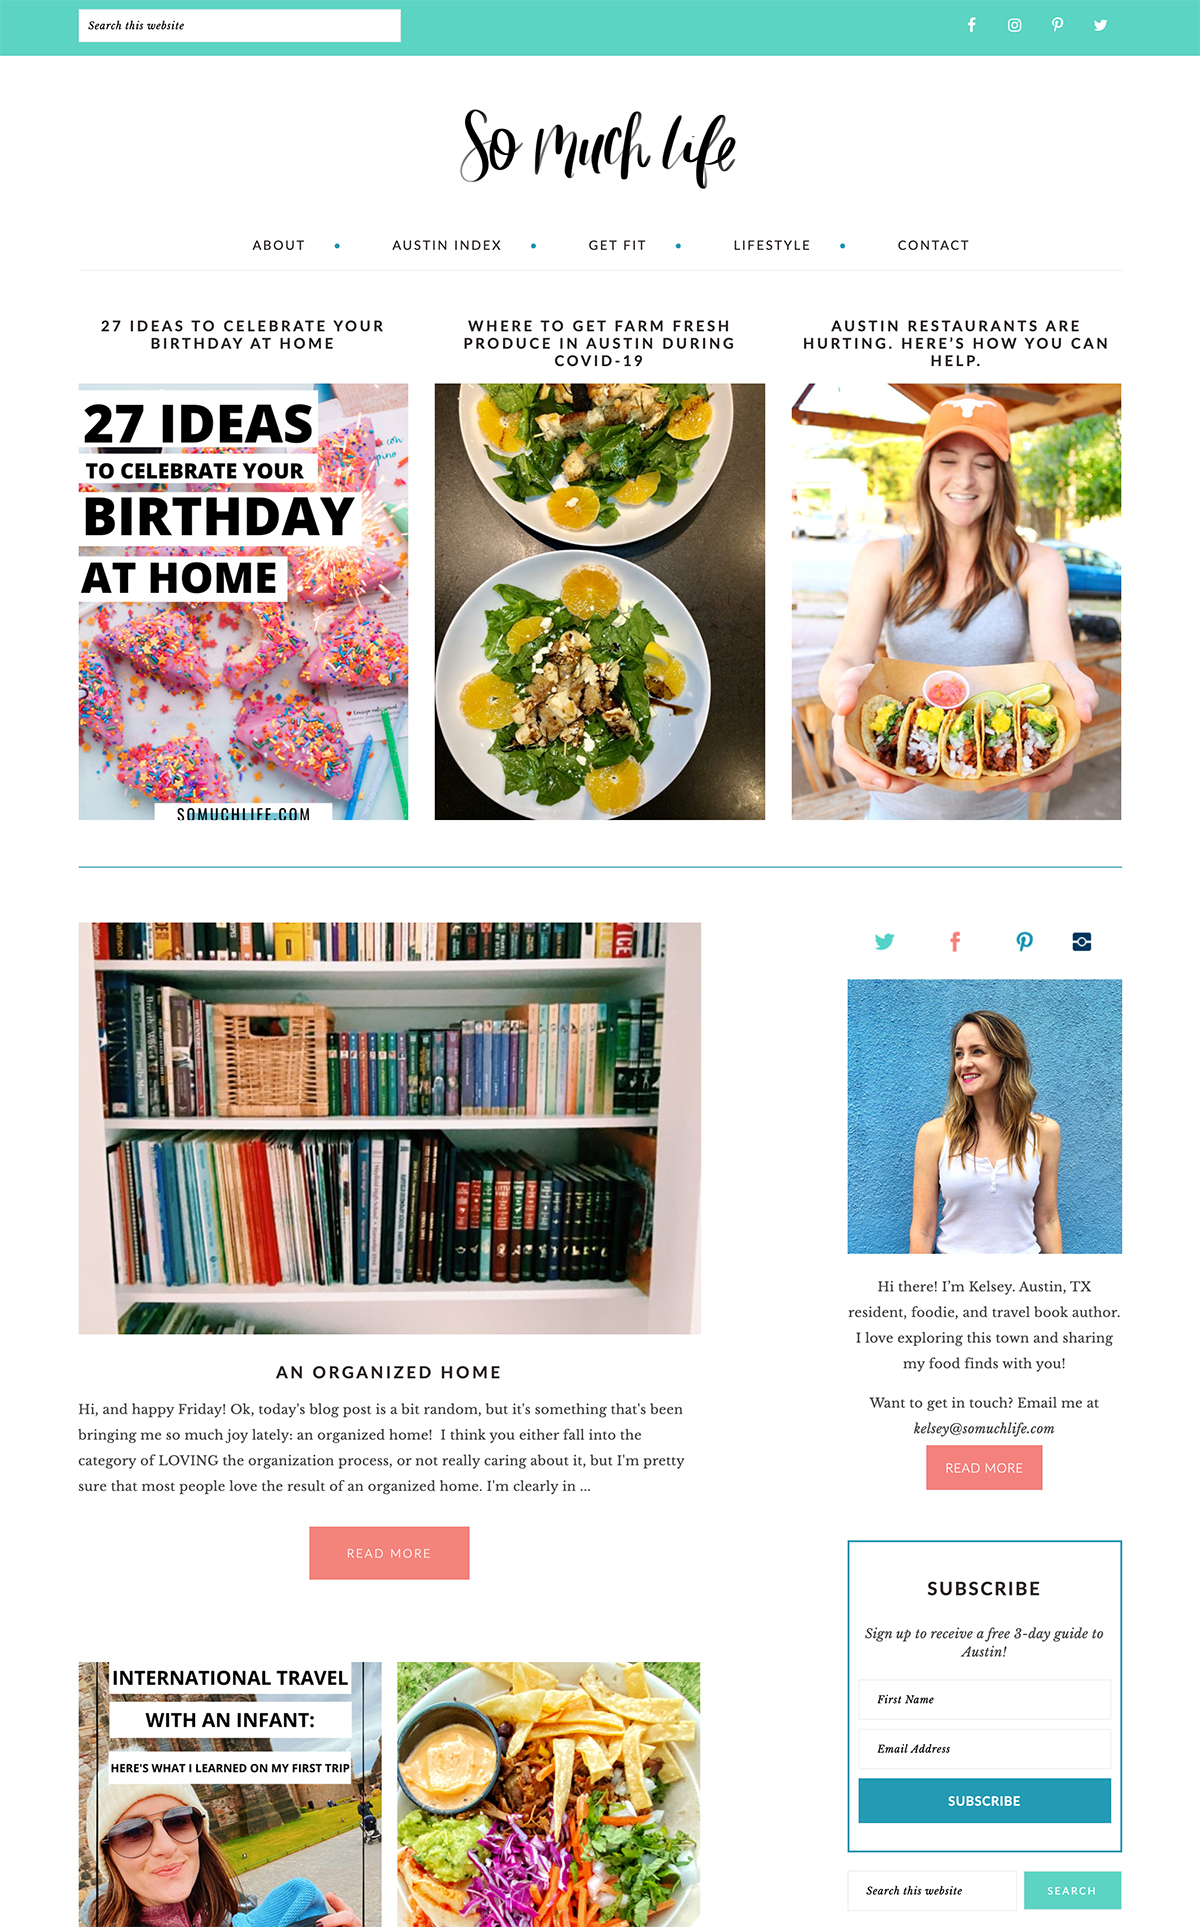 somuchlife-web-design-food-bloggers